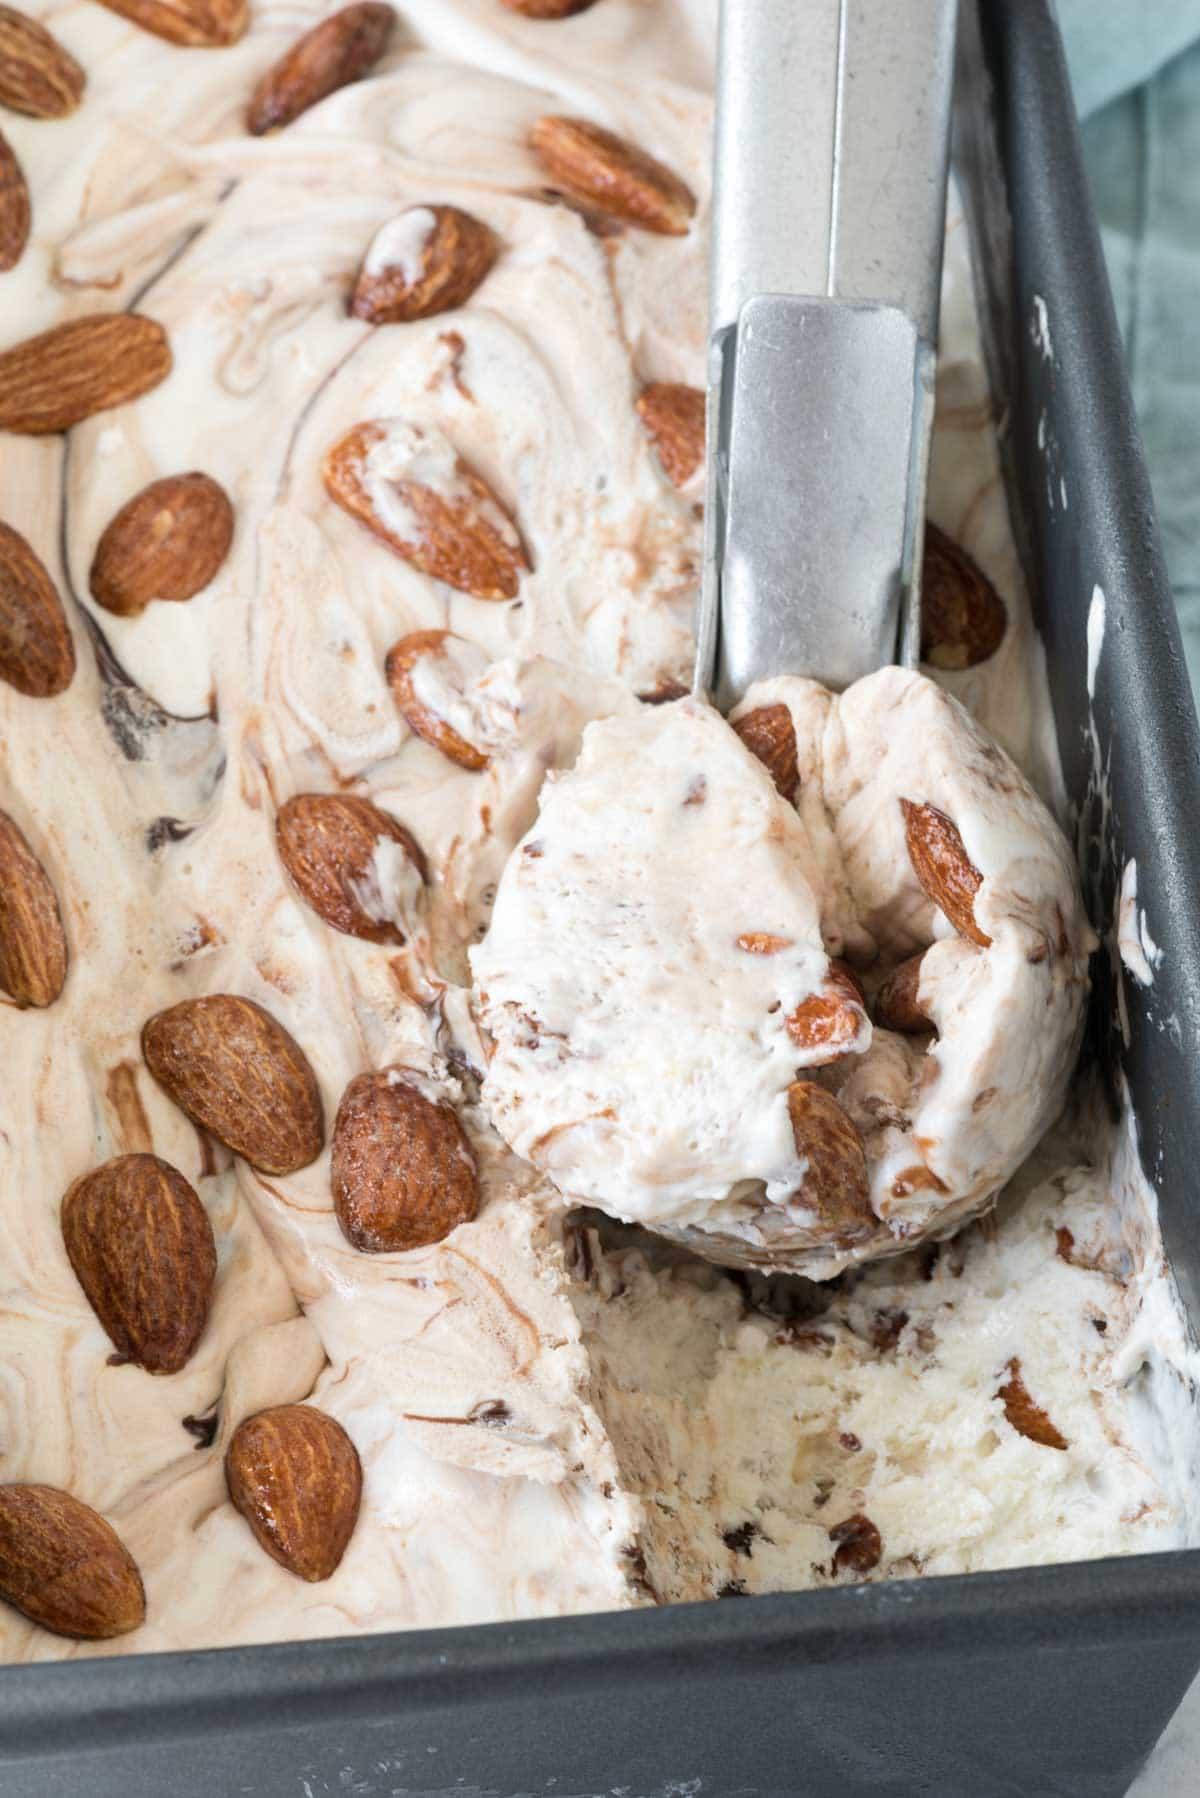 No Churn Almond Fudge Ice Cream Recipe - no machine needed and tons of almonds and hot fudge flavor!